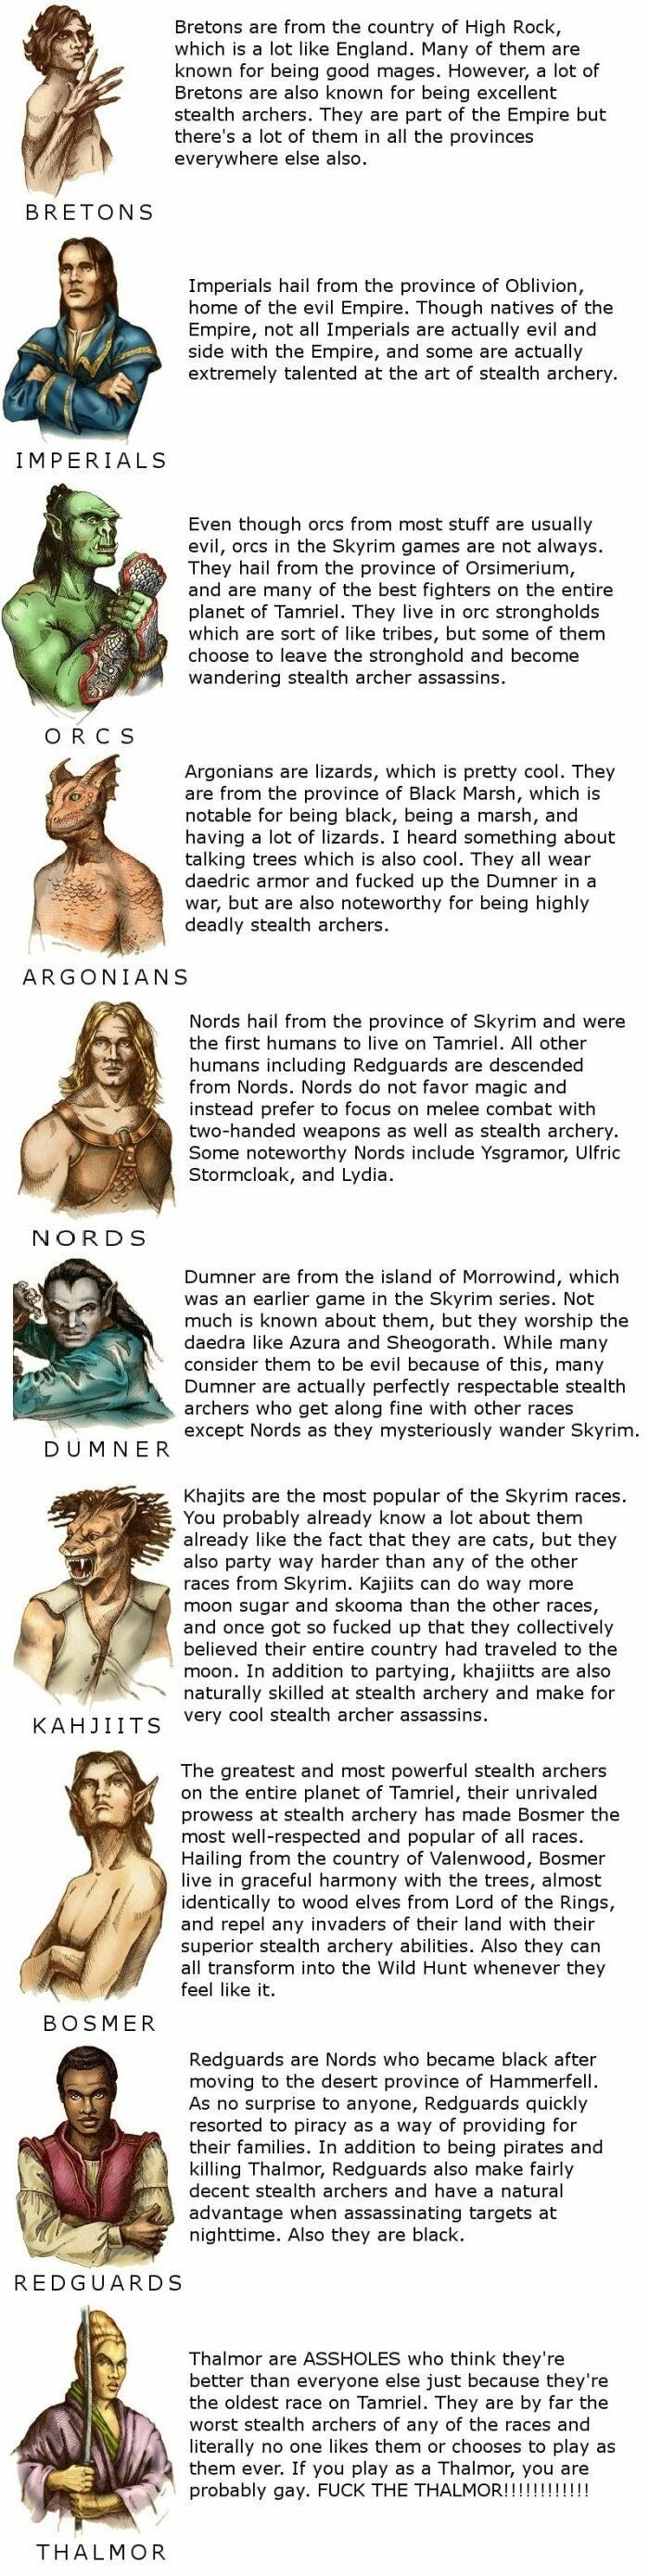 Lore of the Skyrim series